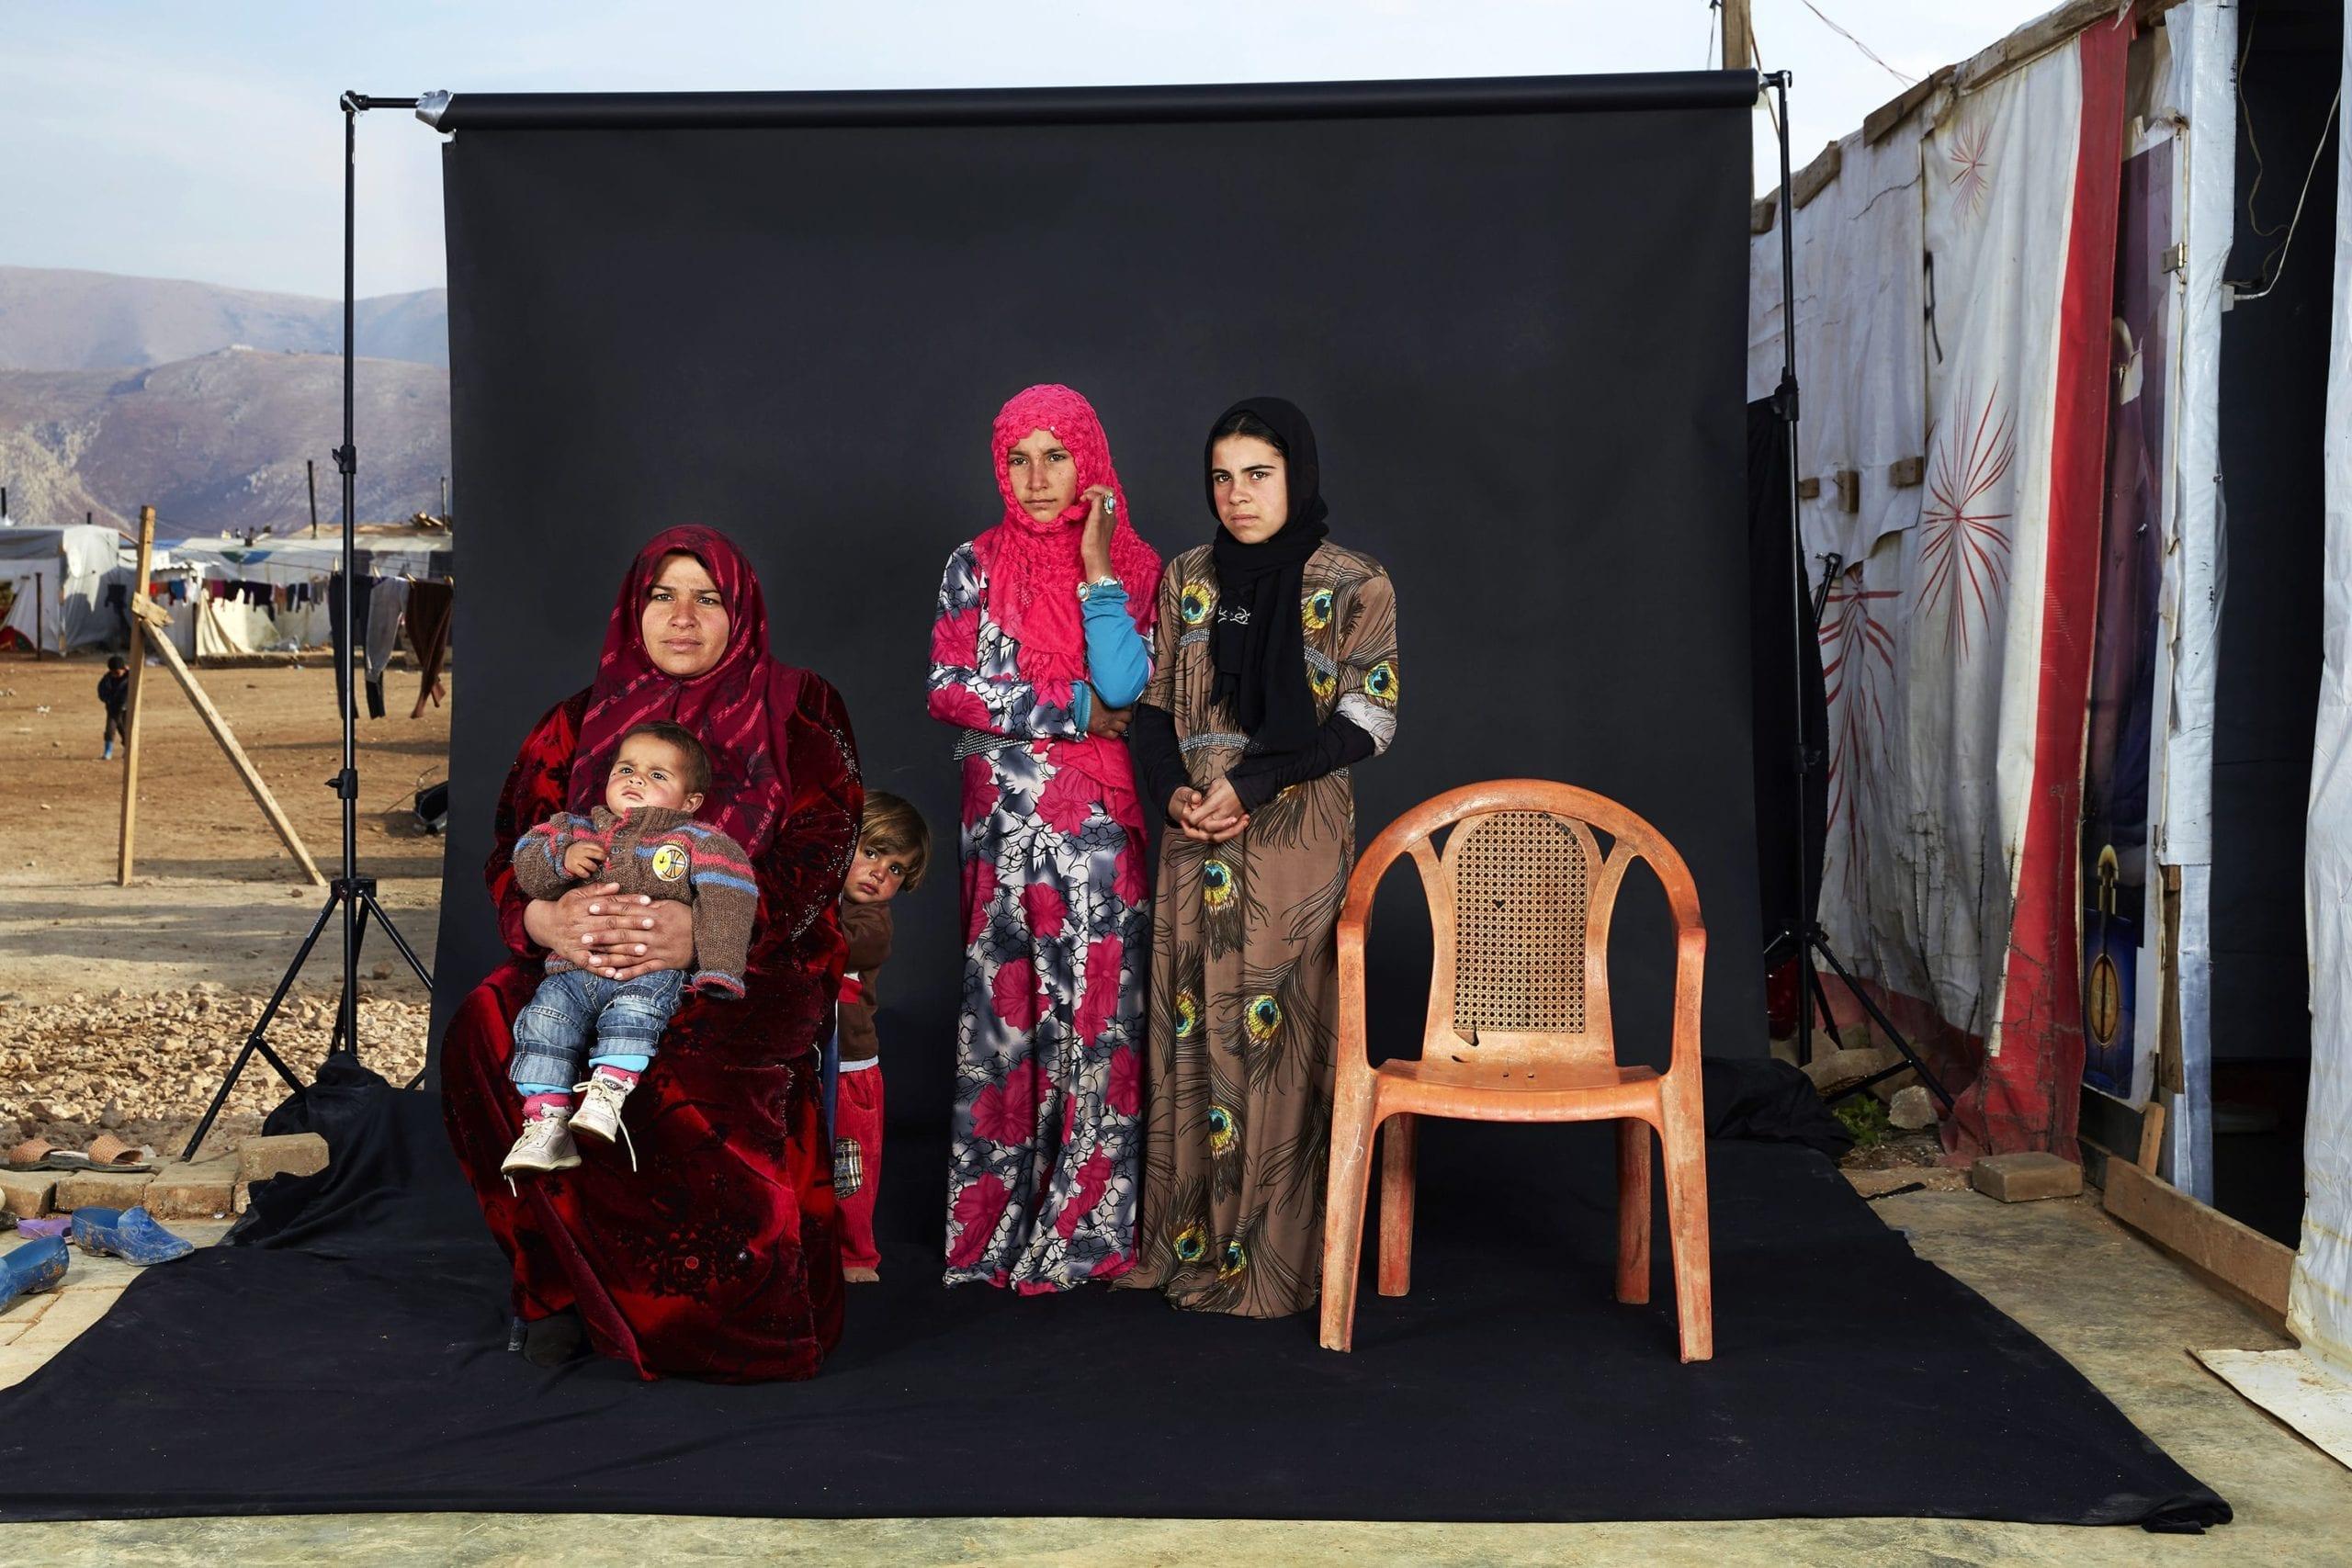 Lost Family Portraits © Dario Mitidieri